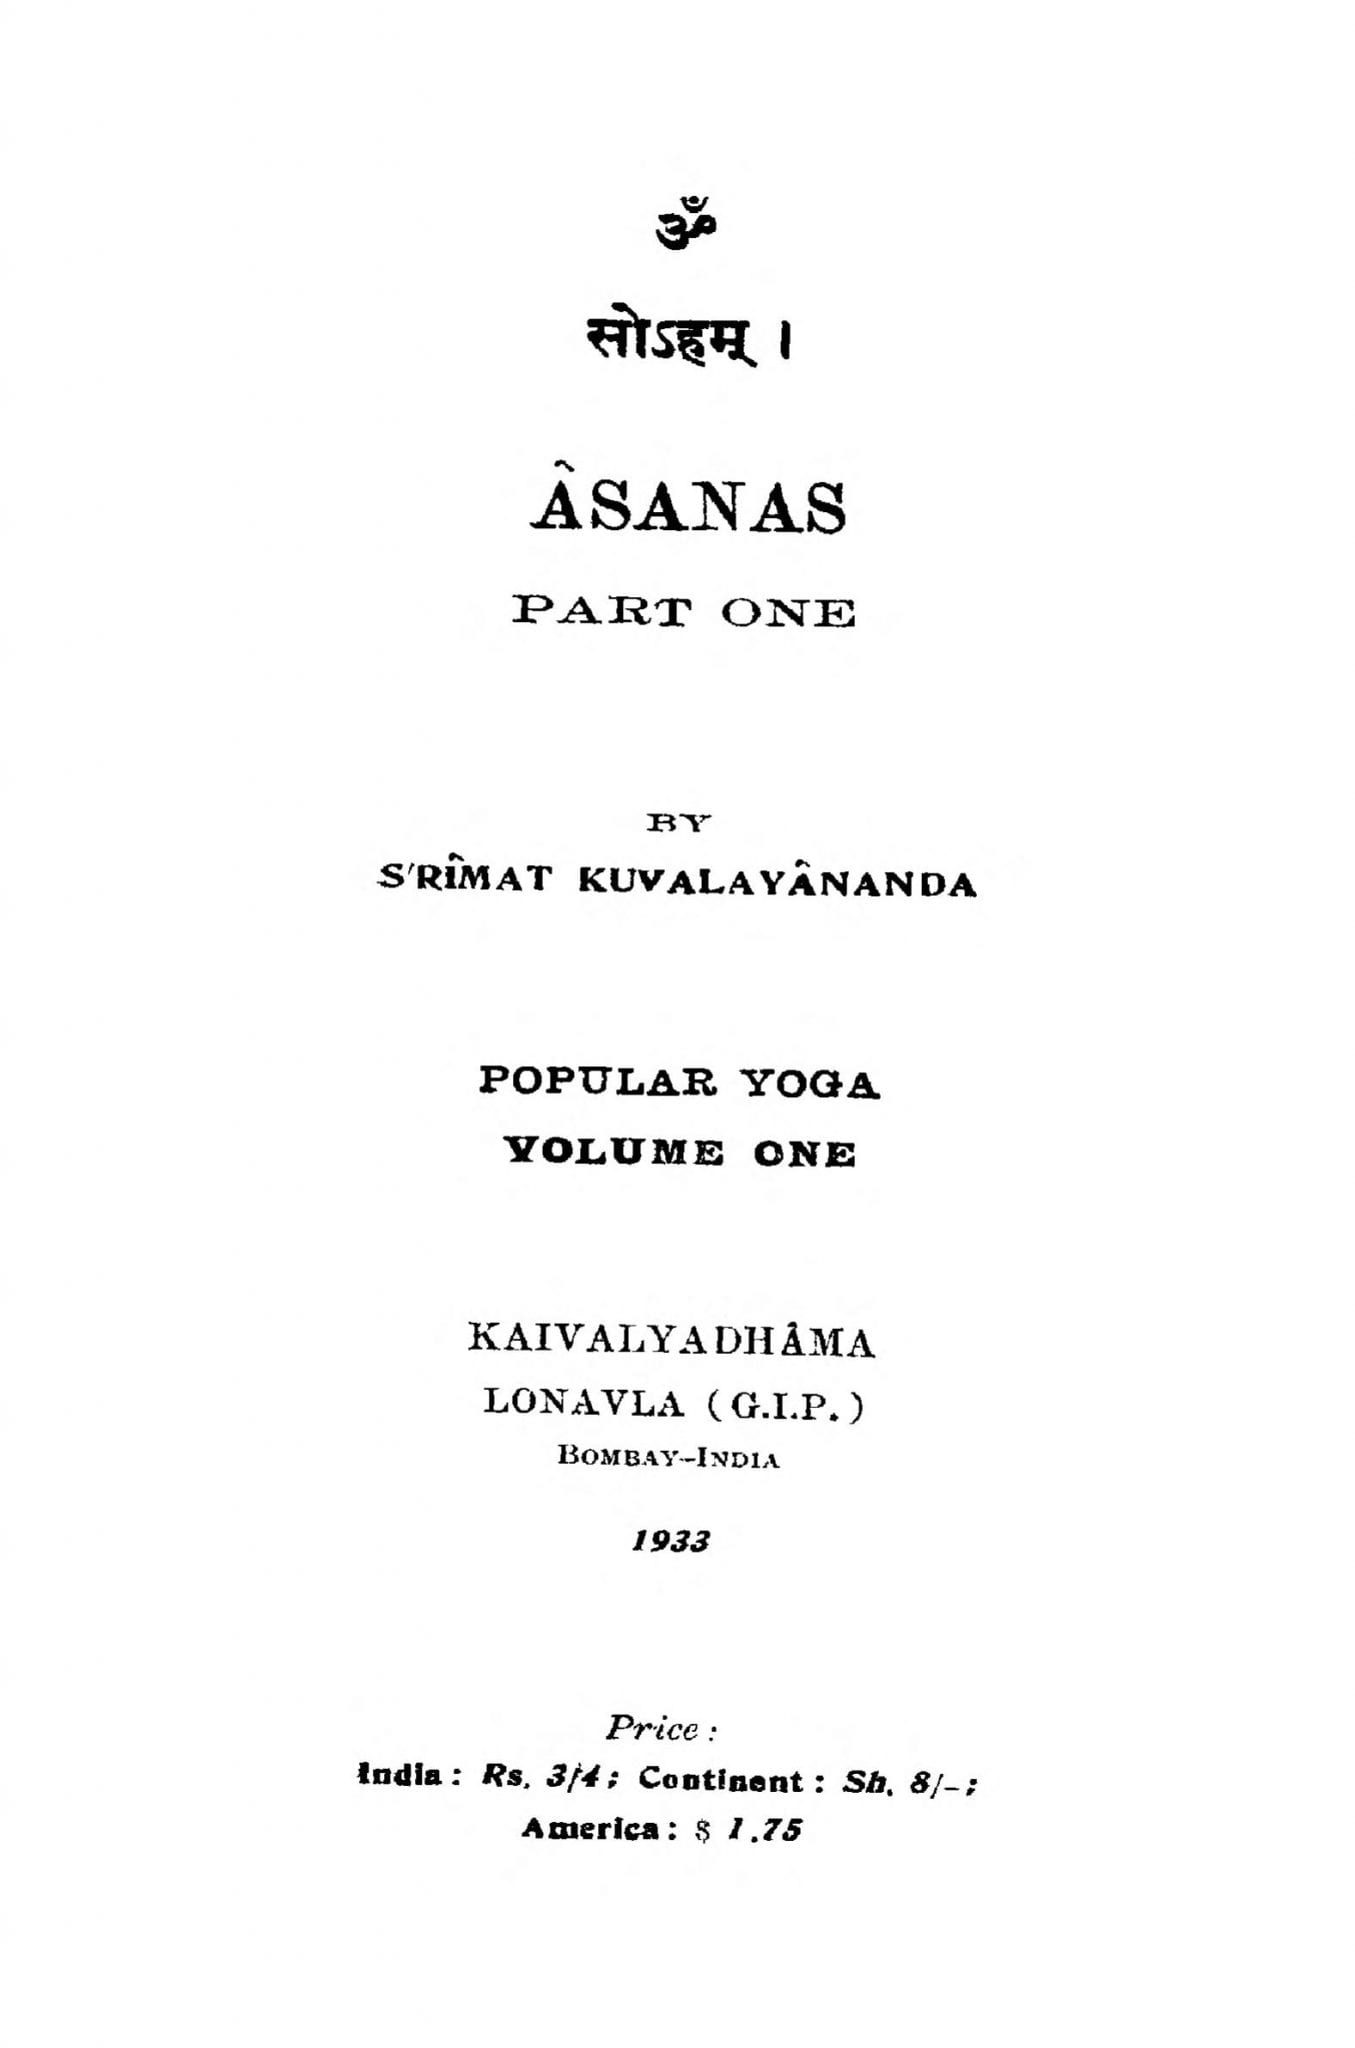 Asanas Part 1  by श्रीमत कुवालायानान्दा - Srimat Kuvalayananda